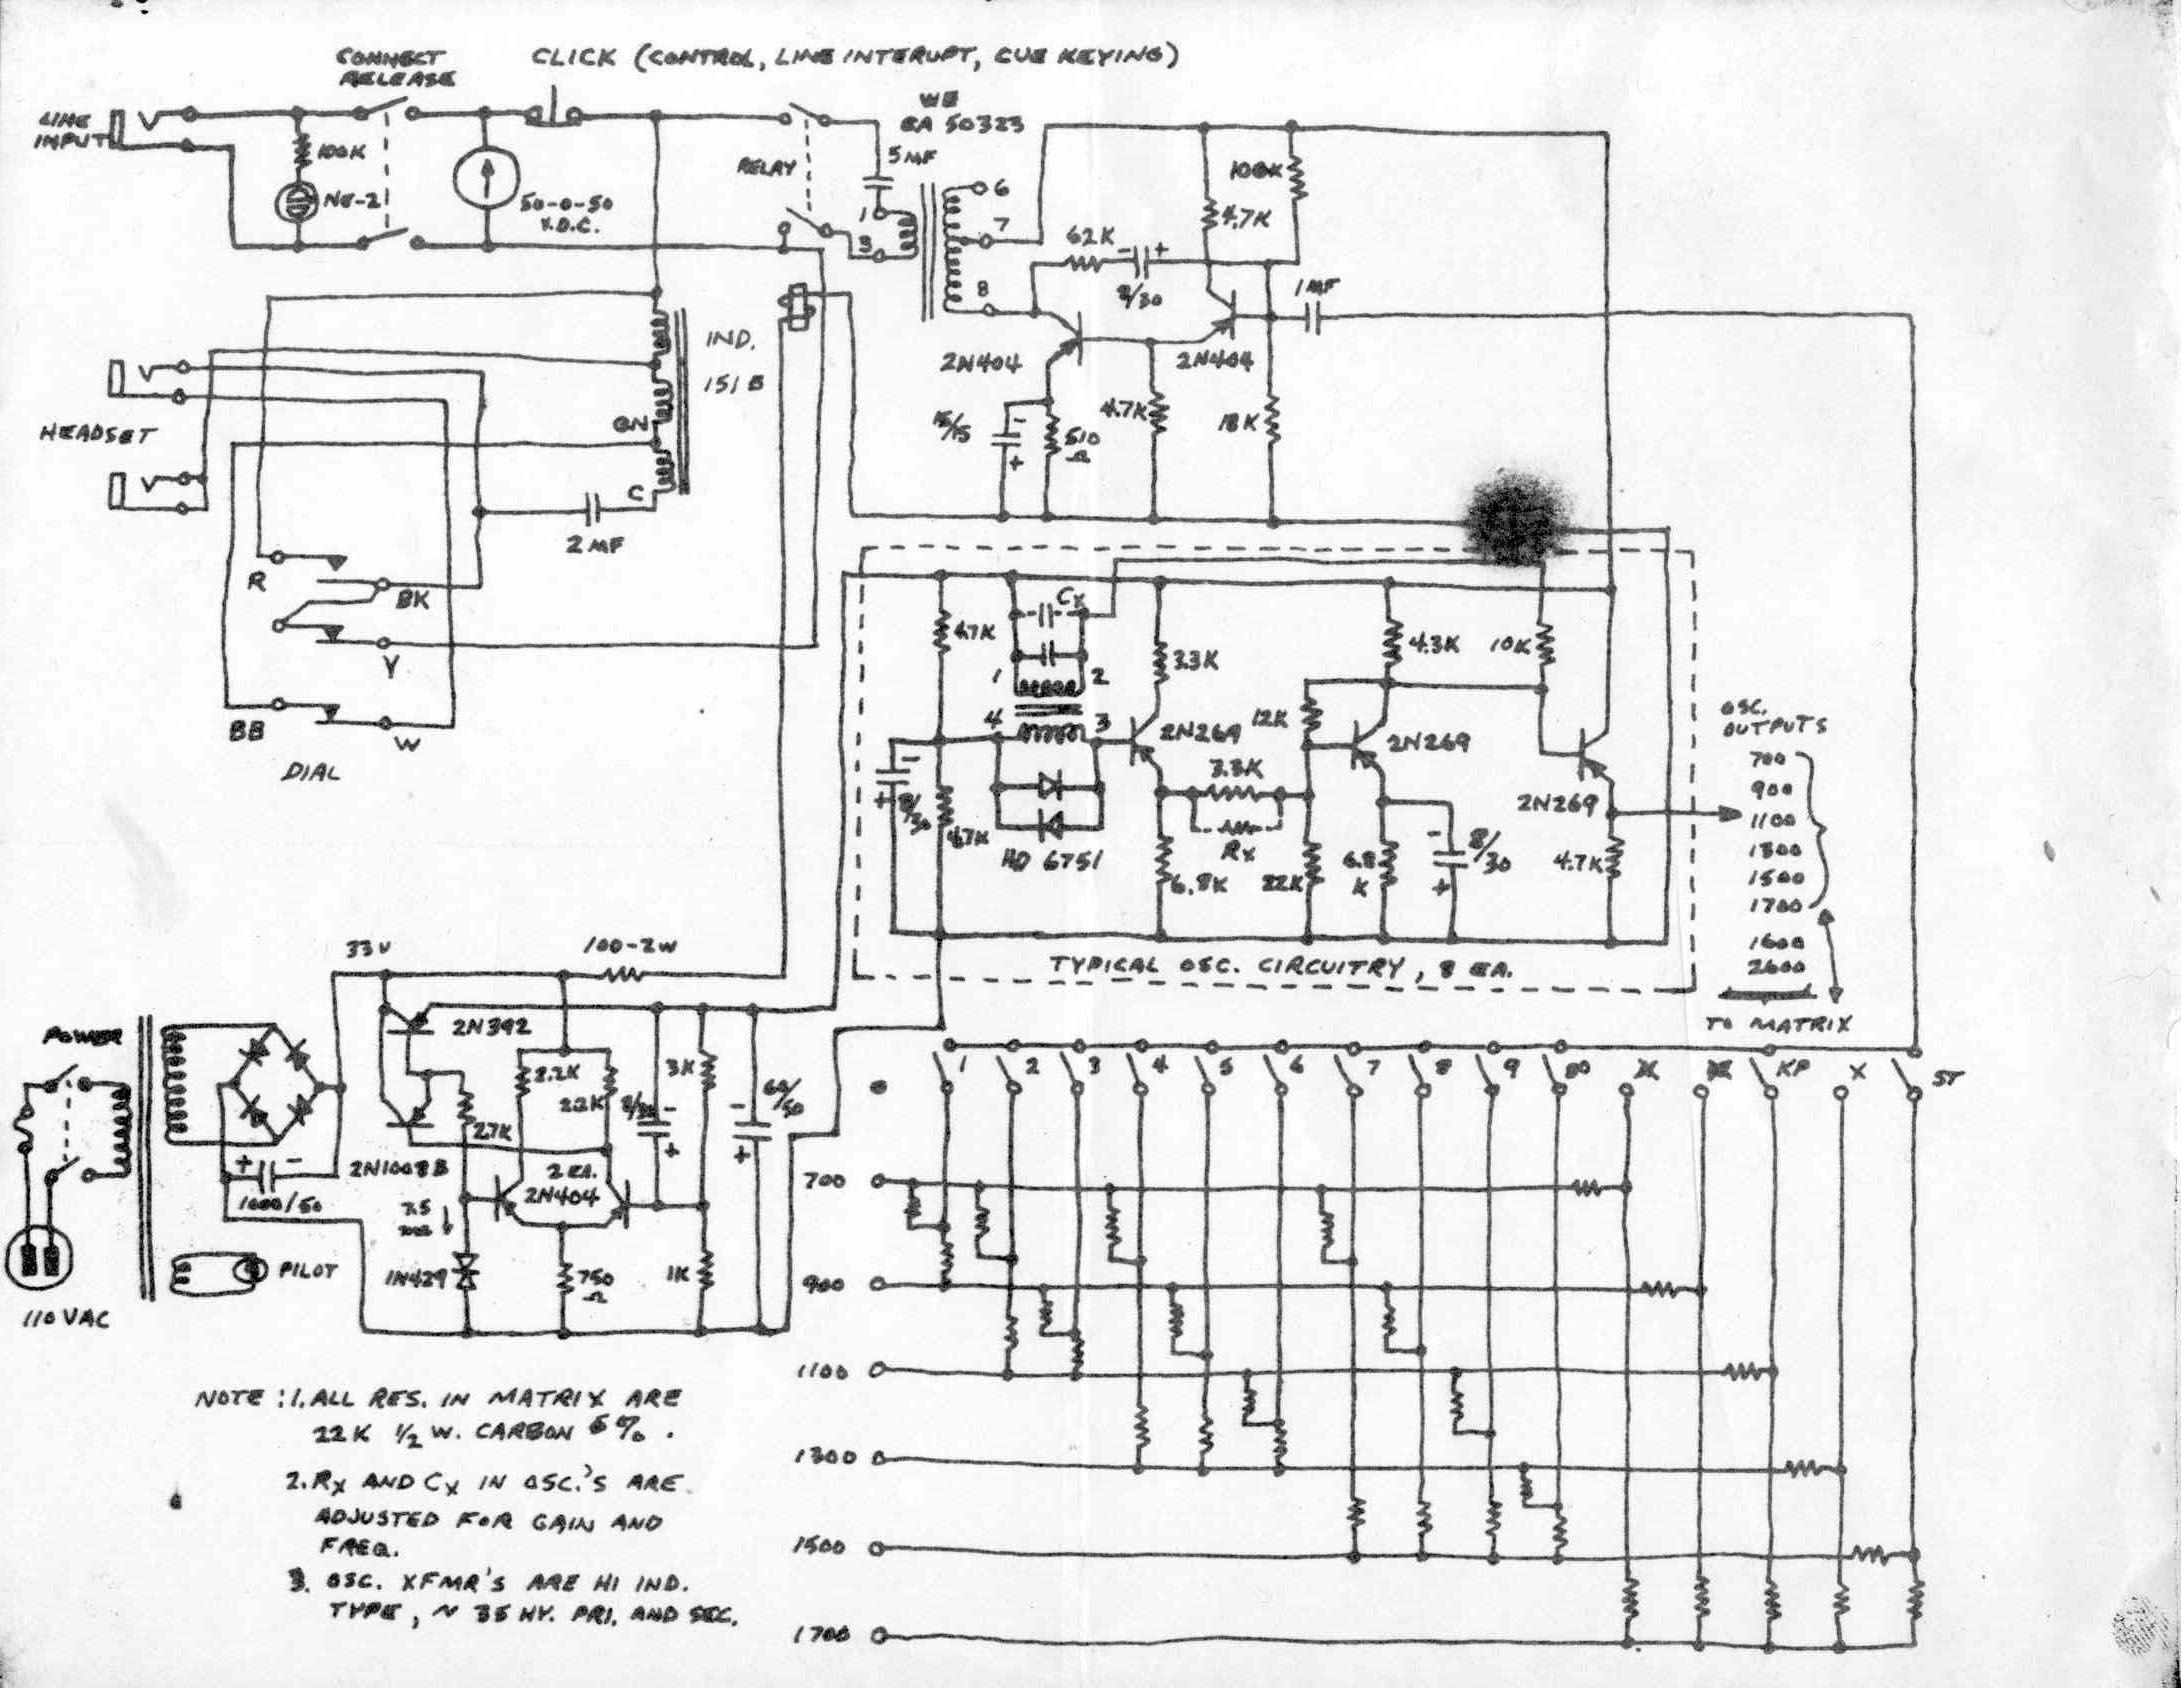 1950 u0026 39 s prototype blue box schematic